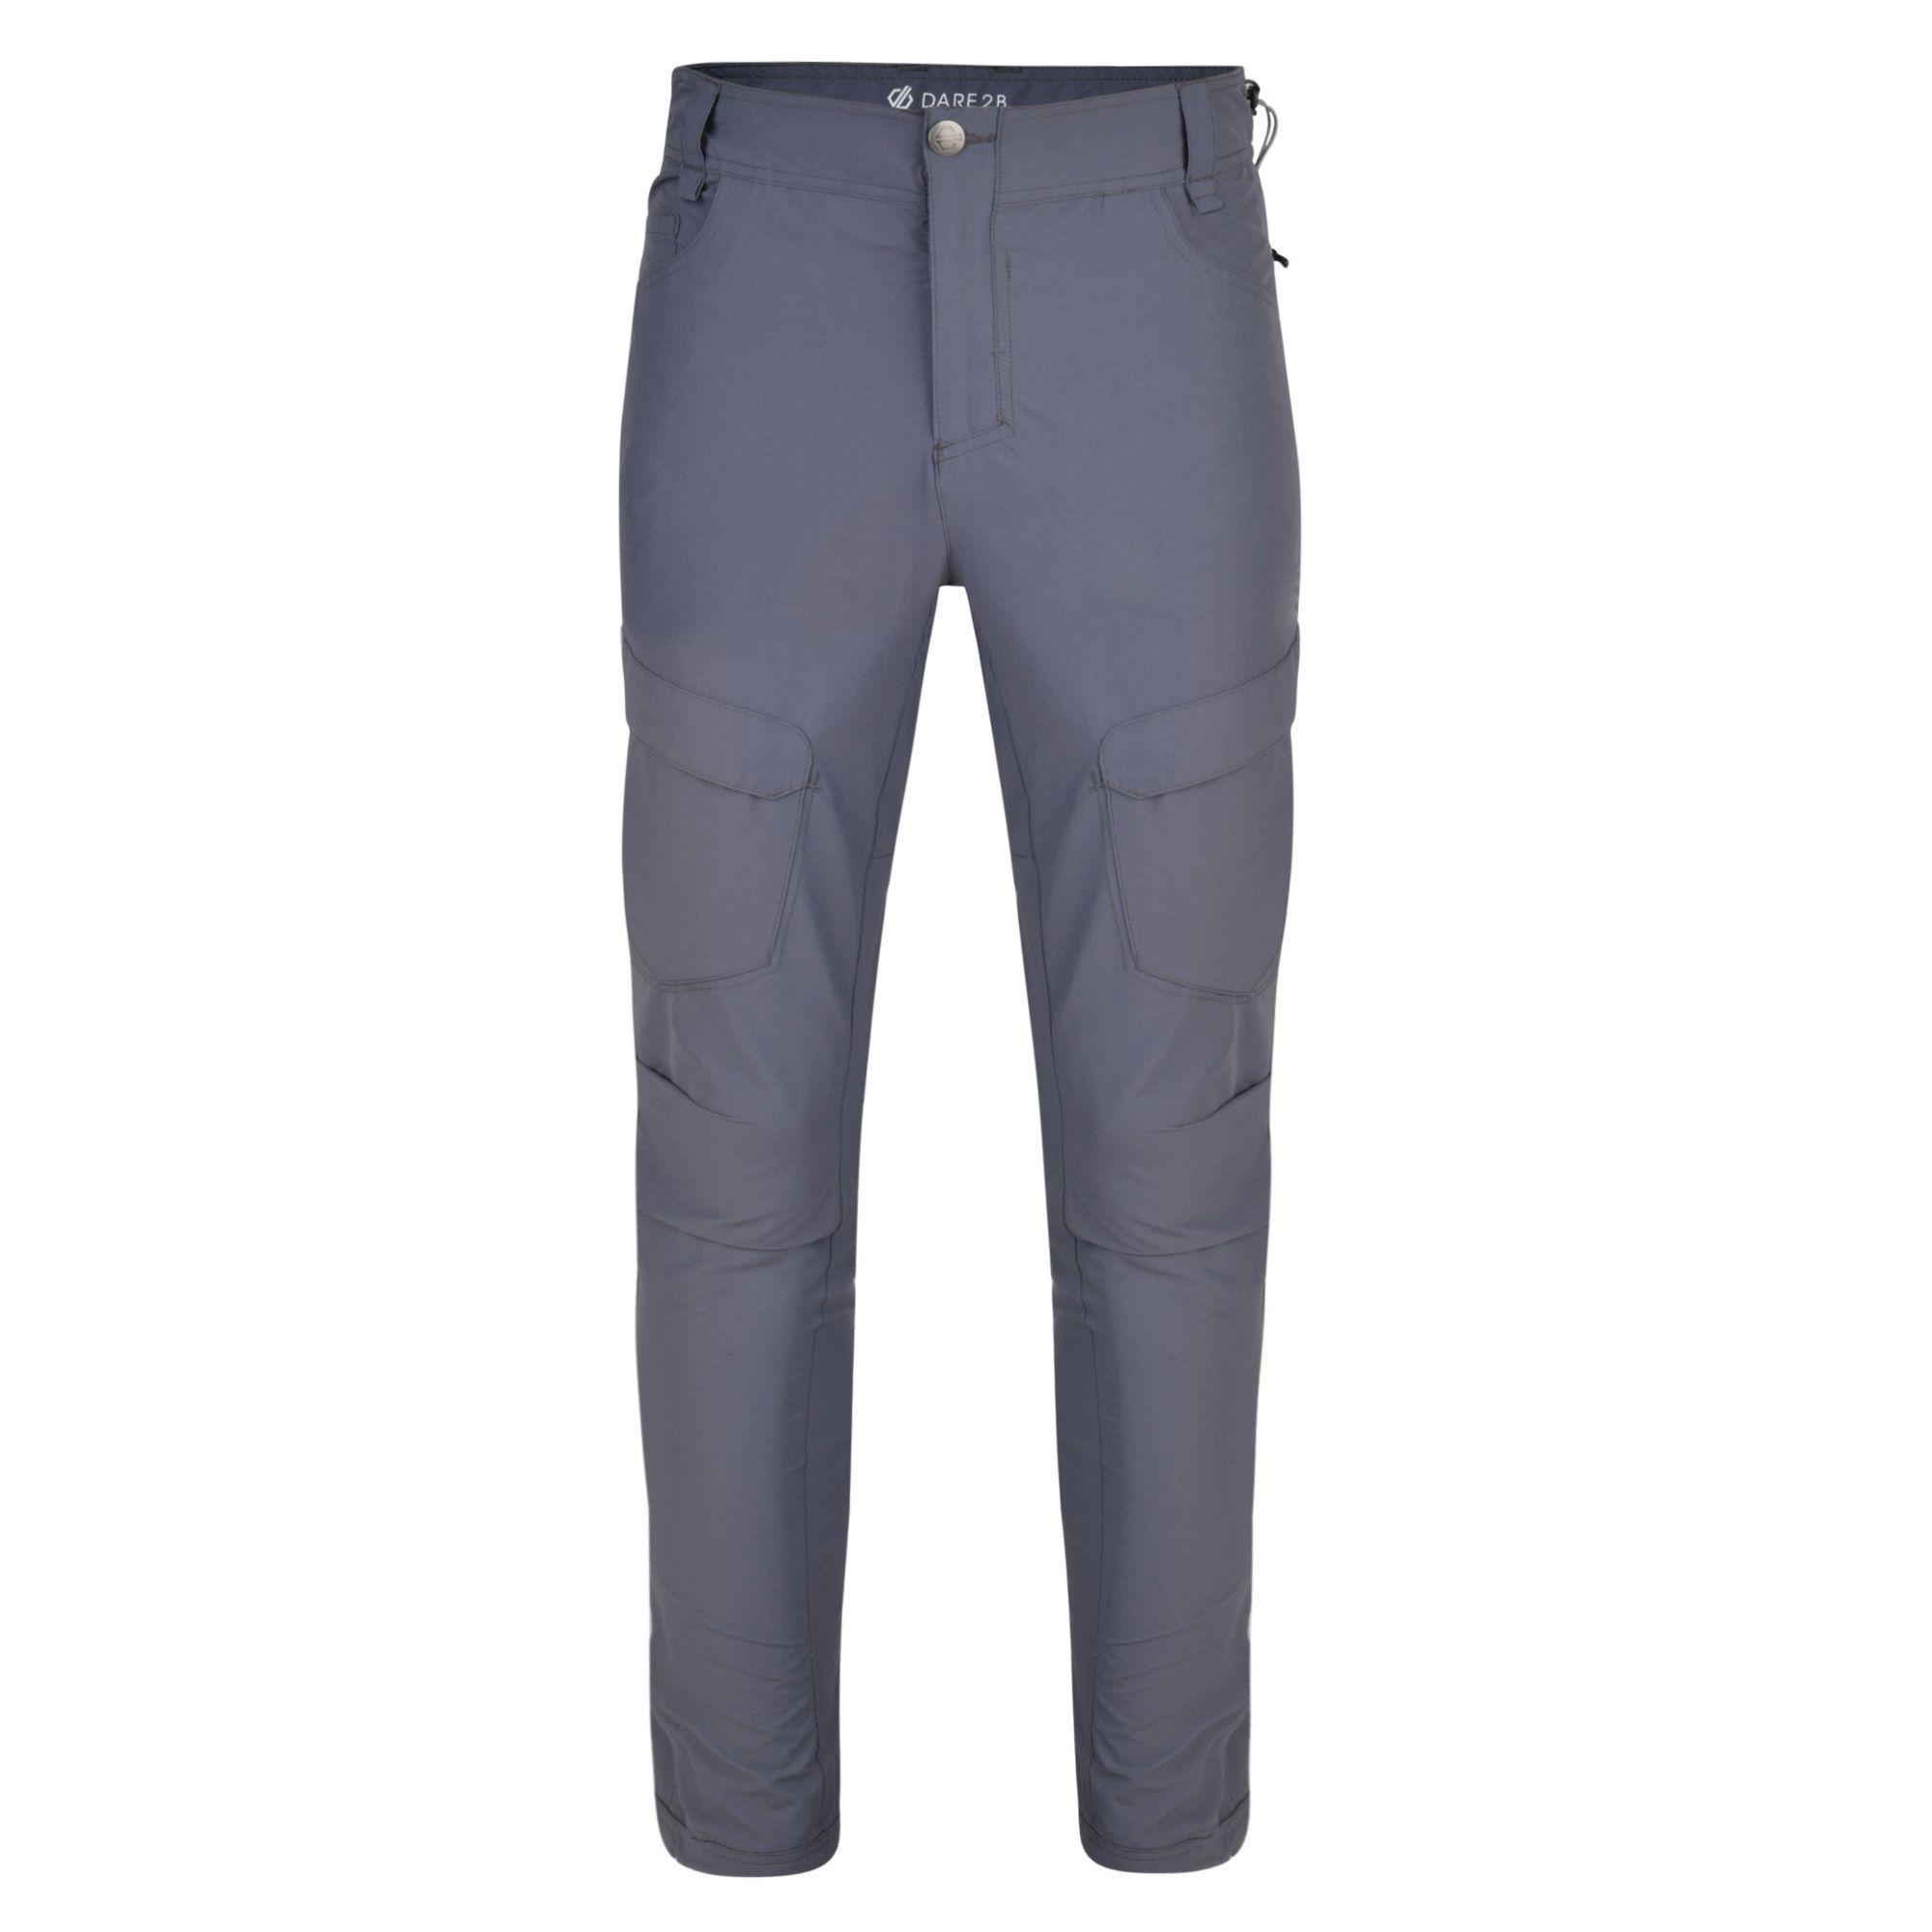 Dare 2B Mens Tuned In II Walking Trousers (Quarry Grey)